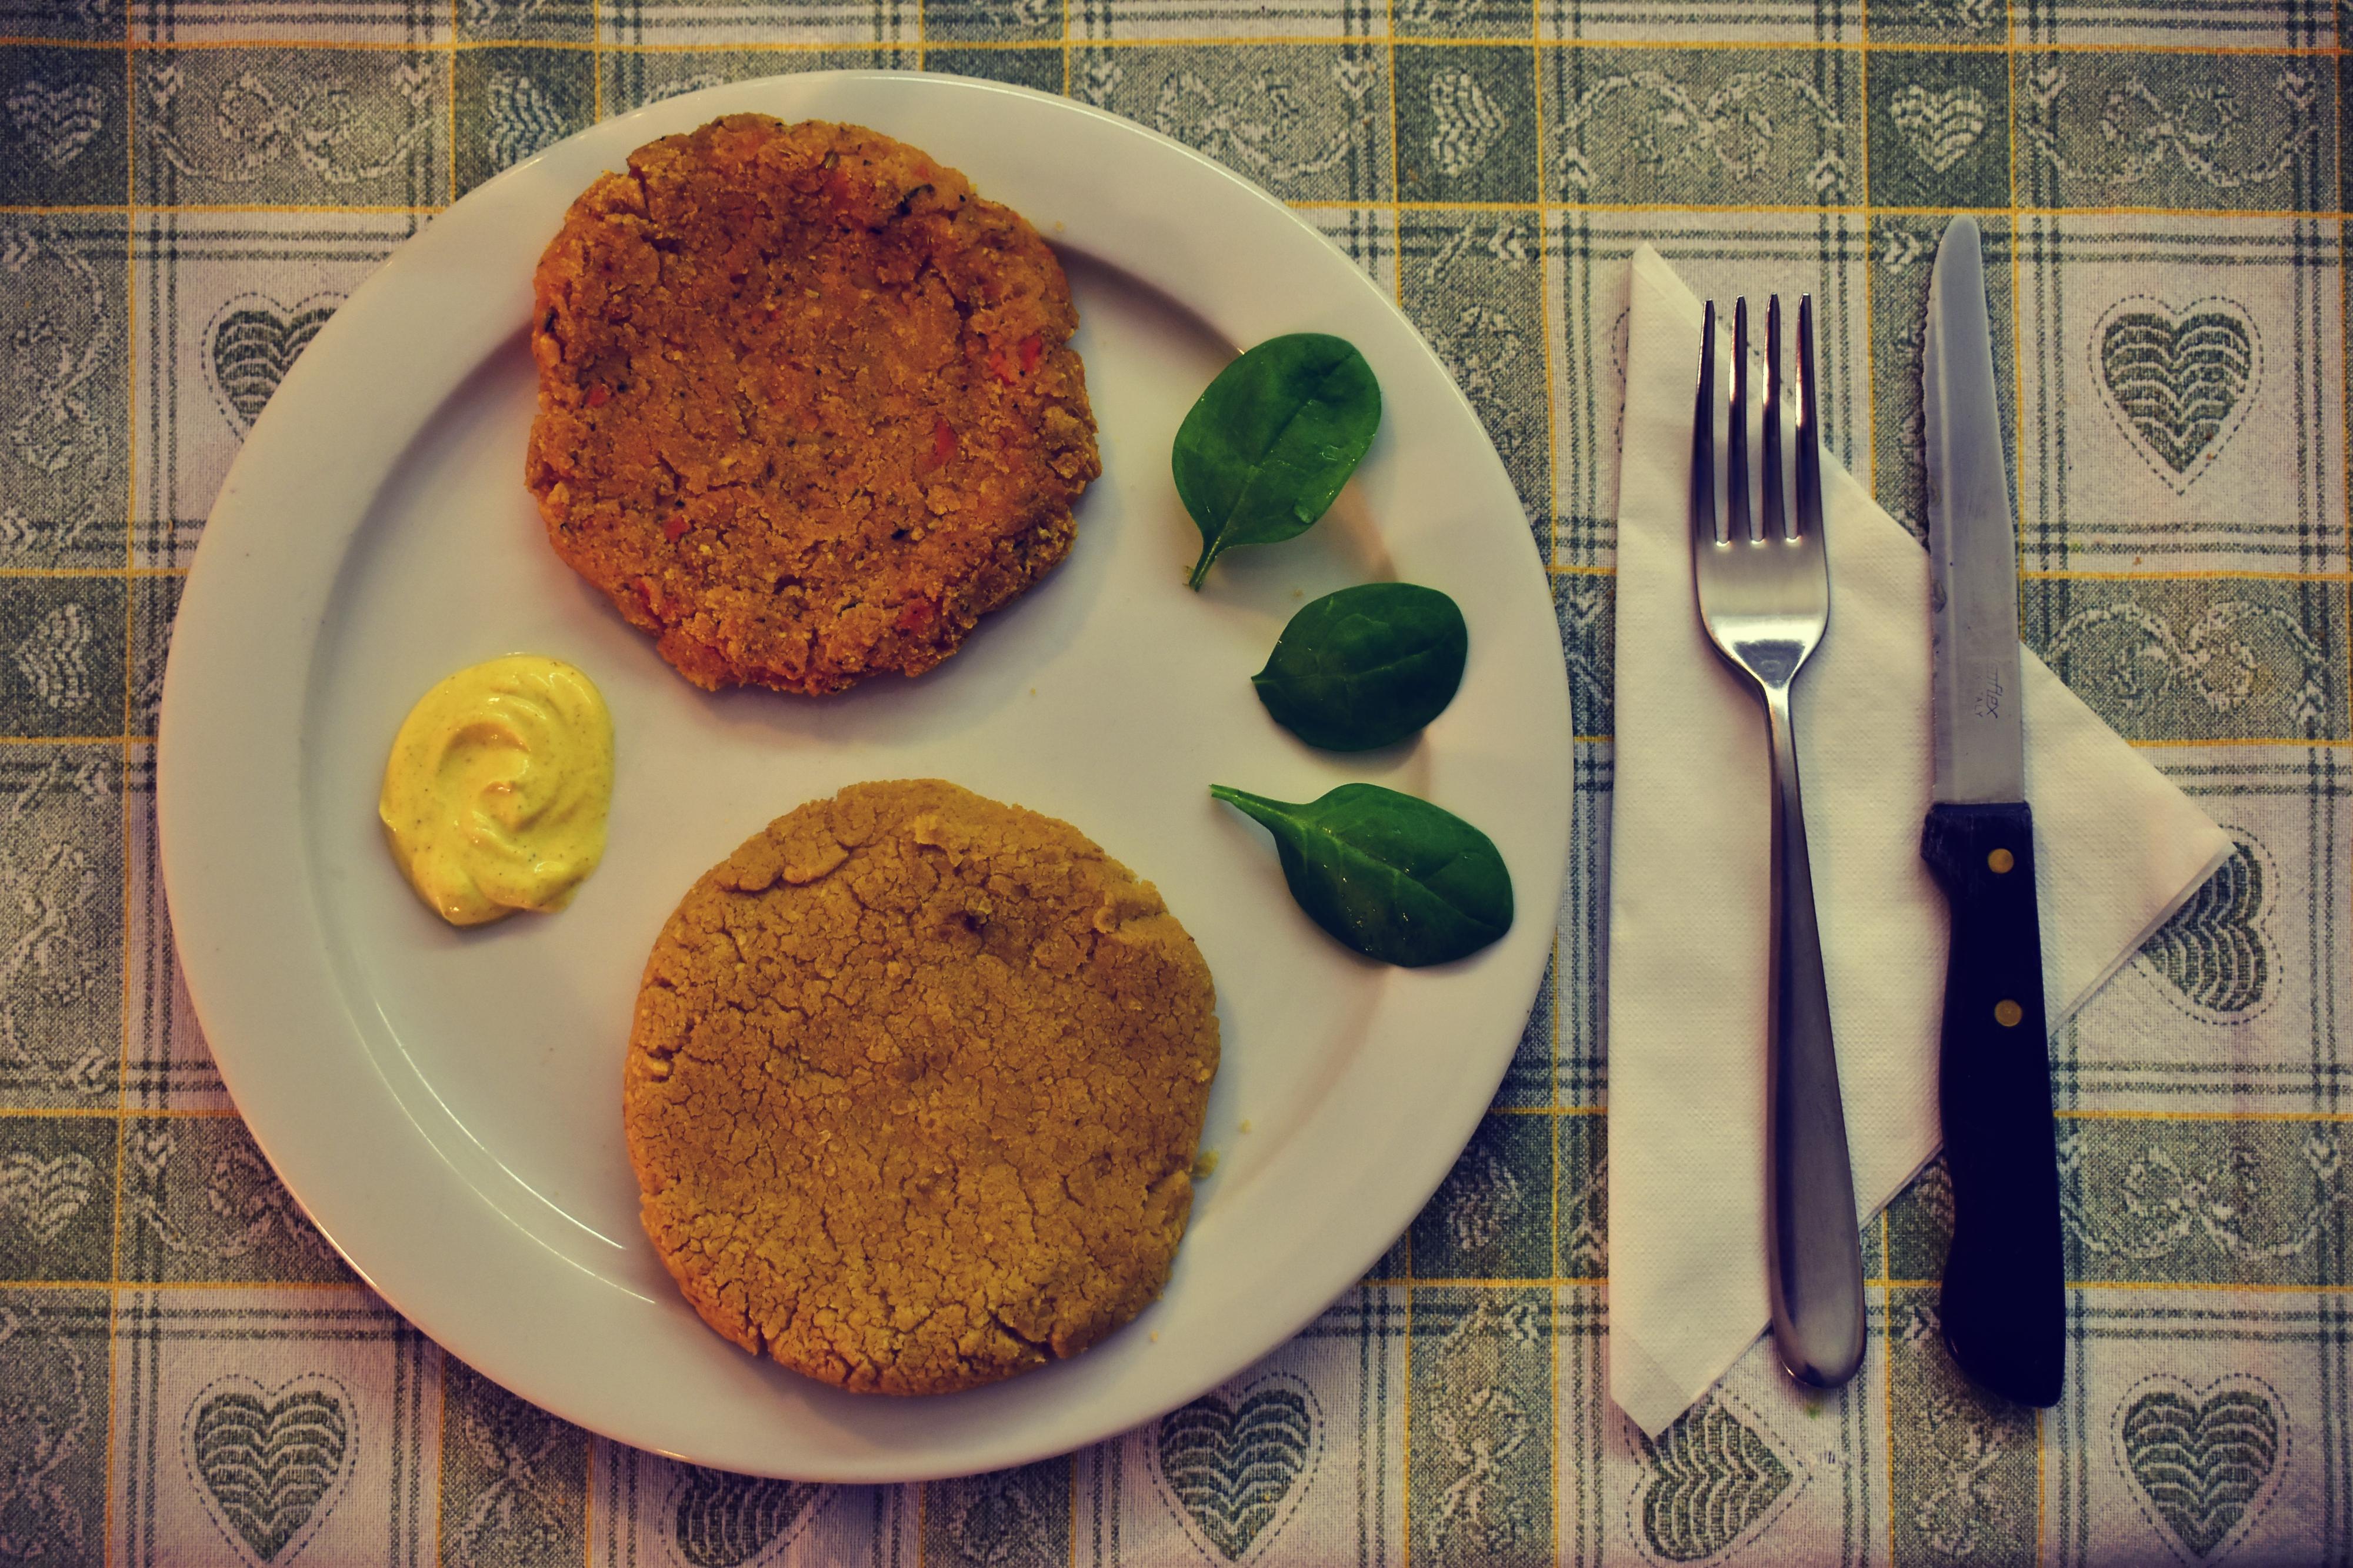 Chickpeas and vegetables vegan burger